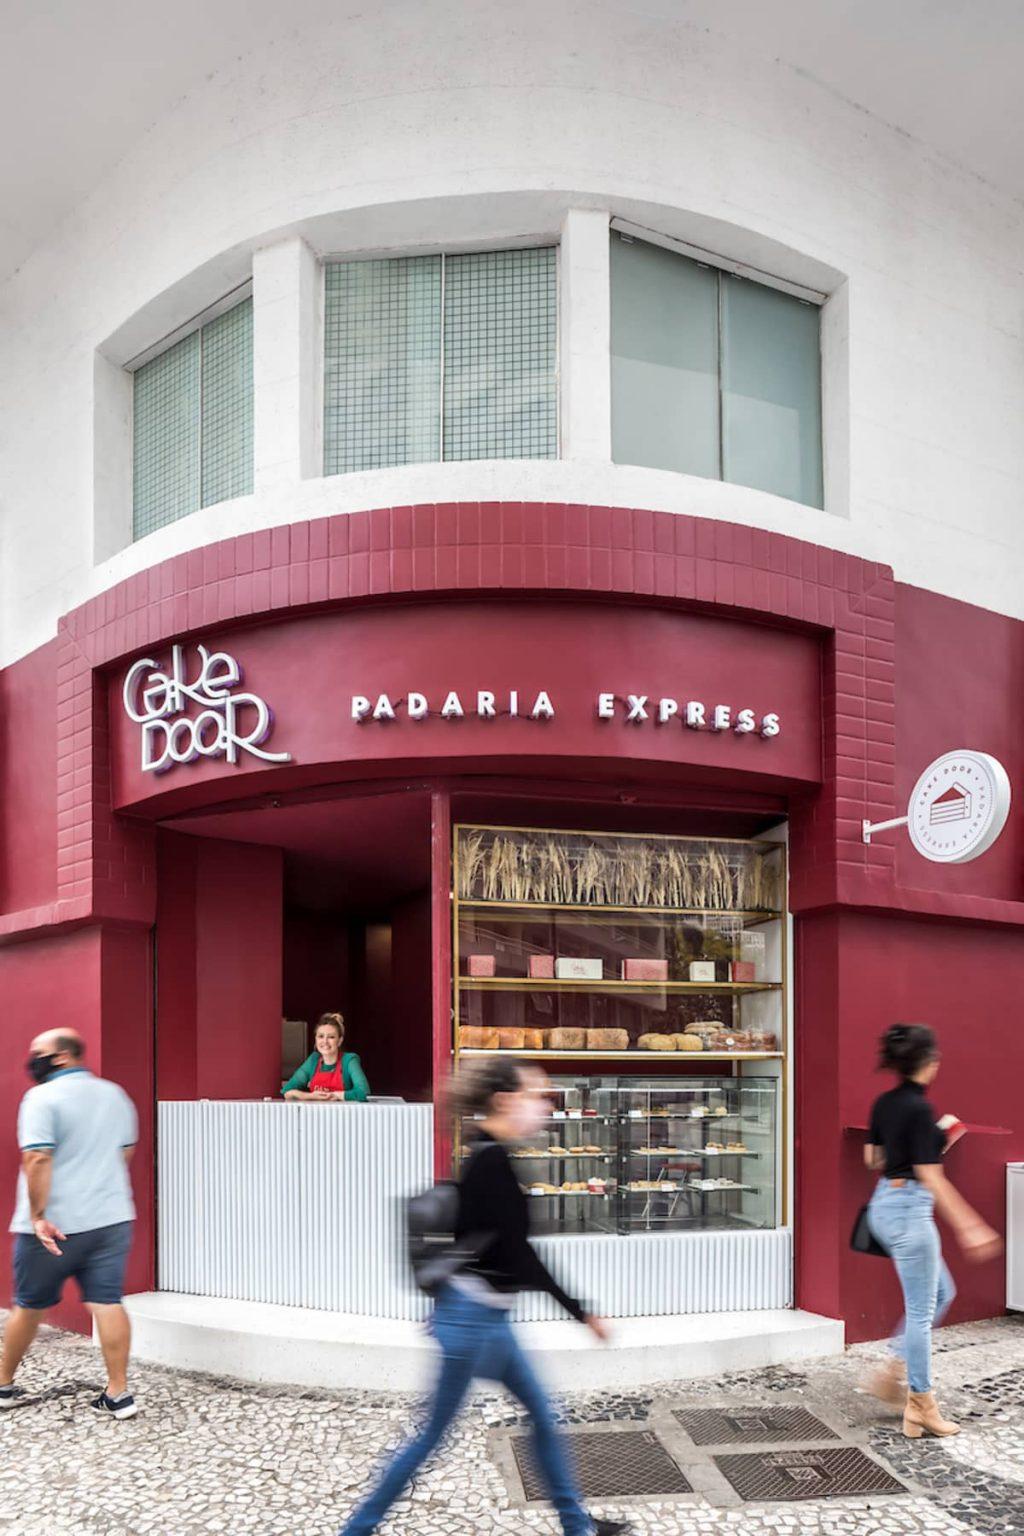 Cake Door – a Corner Bakery by BOSCARDIN CORSI Architects